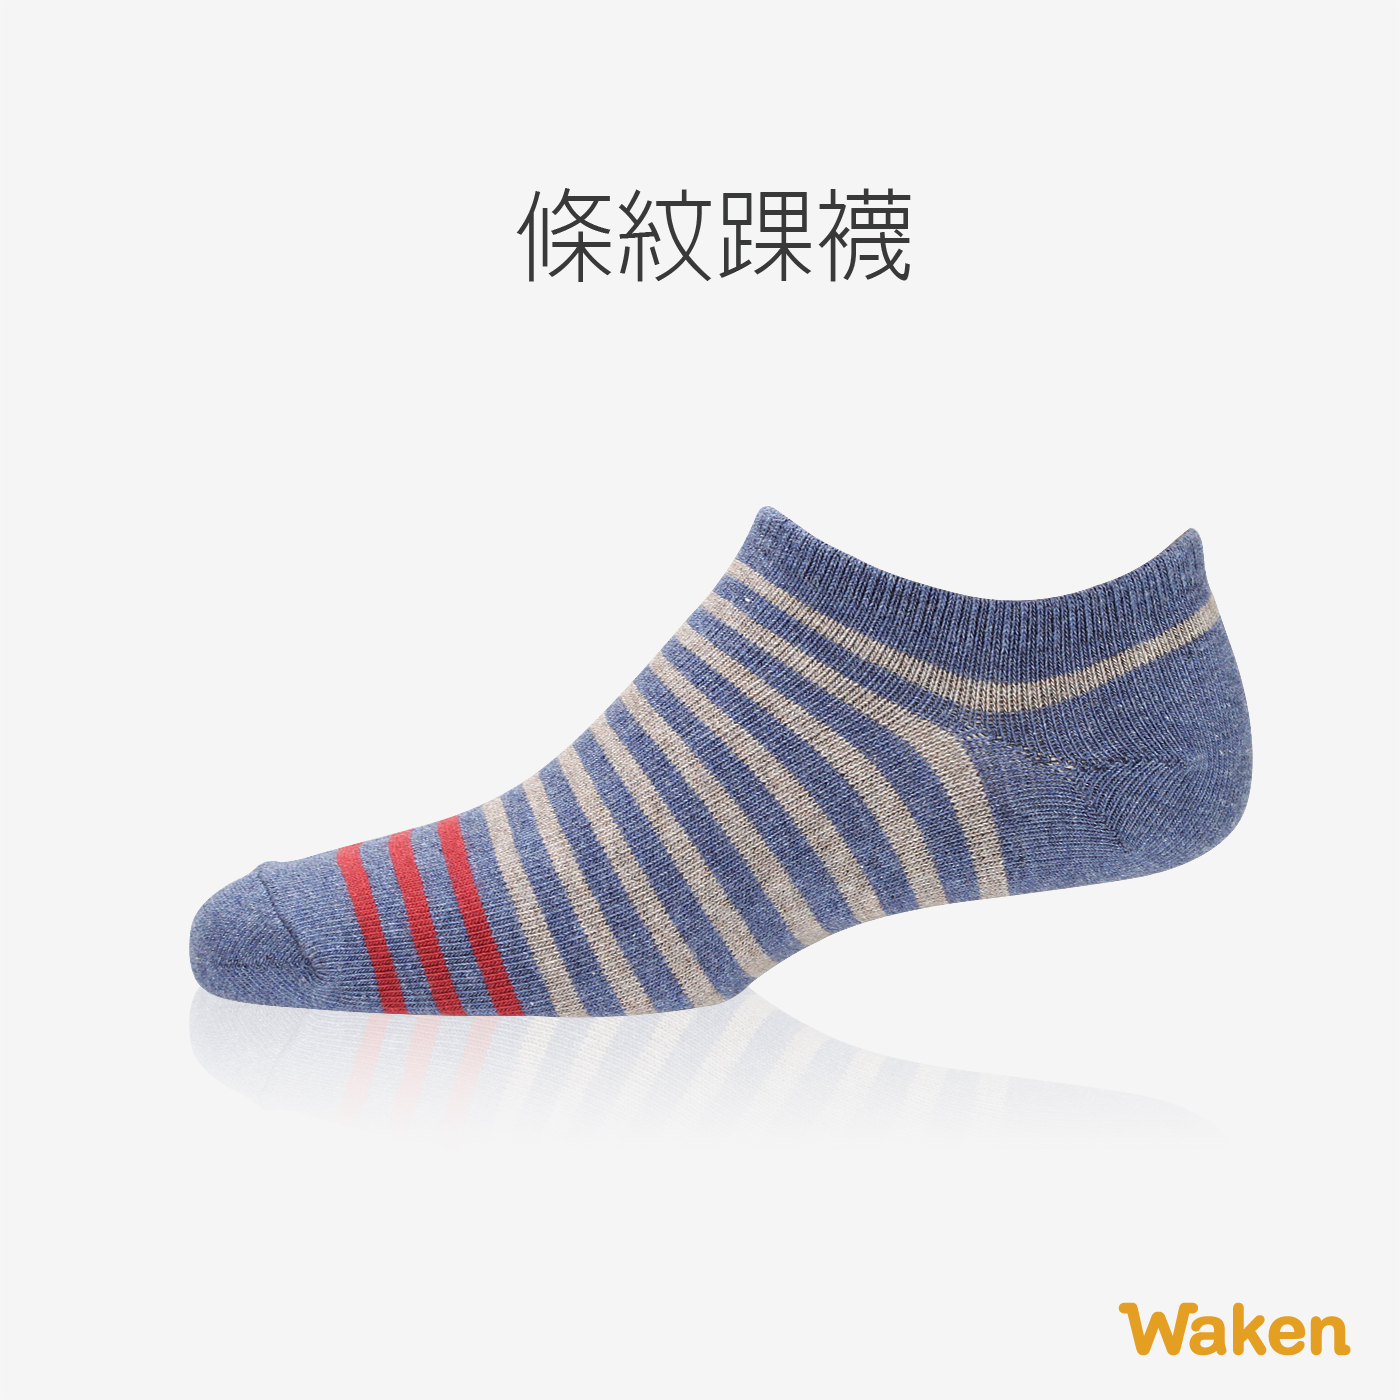 Waken  精梳棉條紋船型襪 / 麻花藍 / 男款